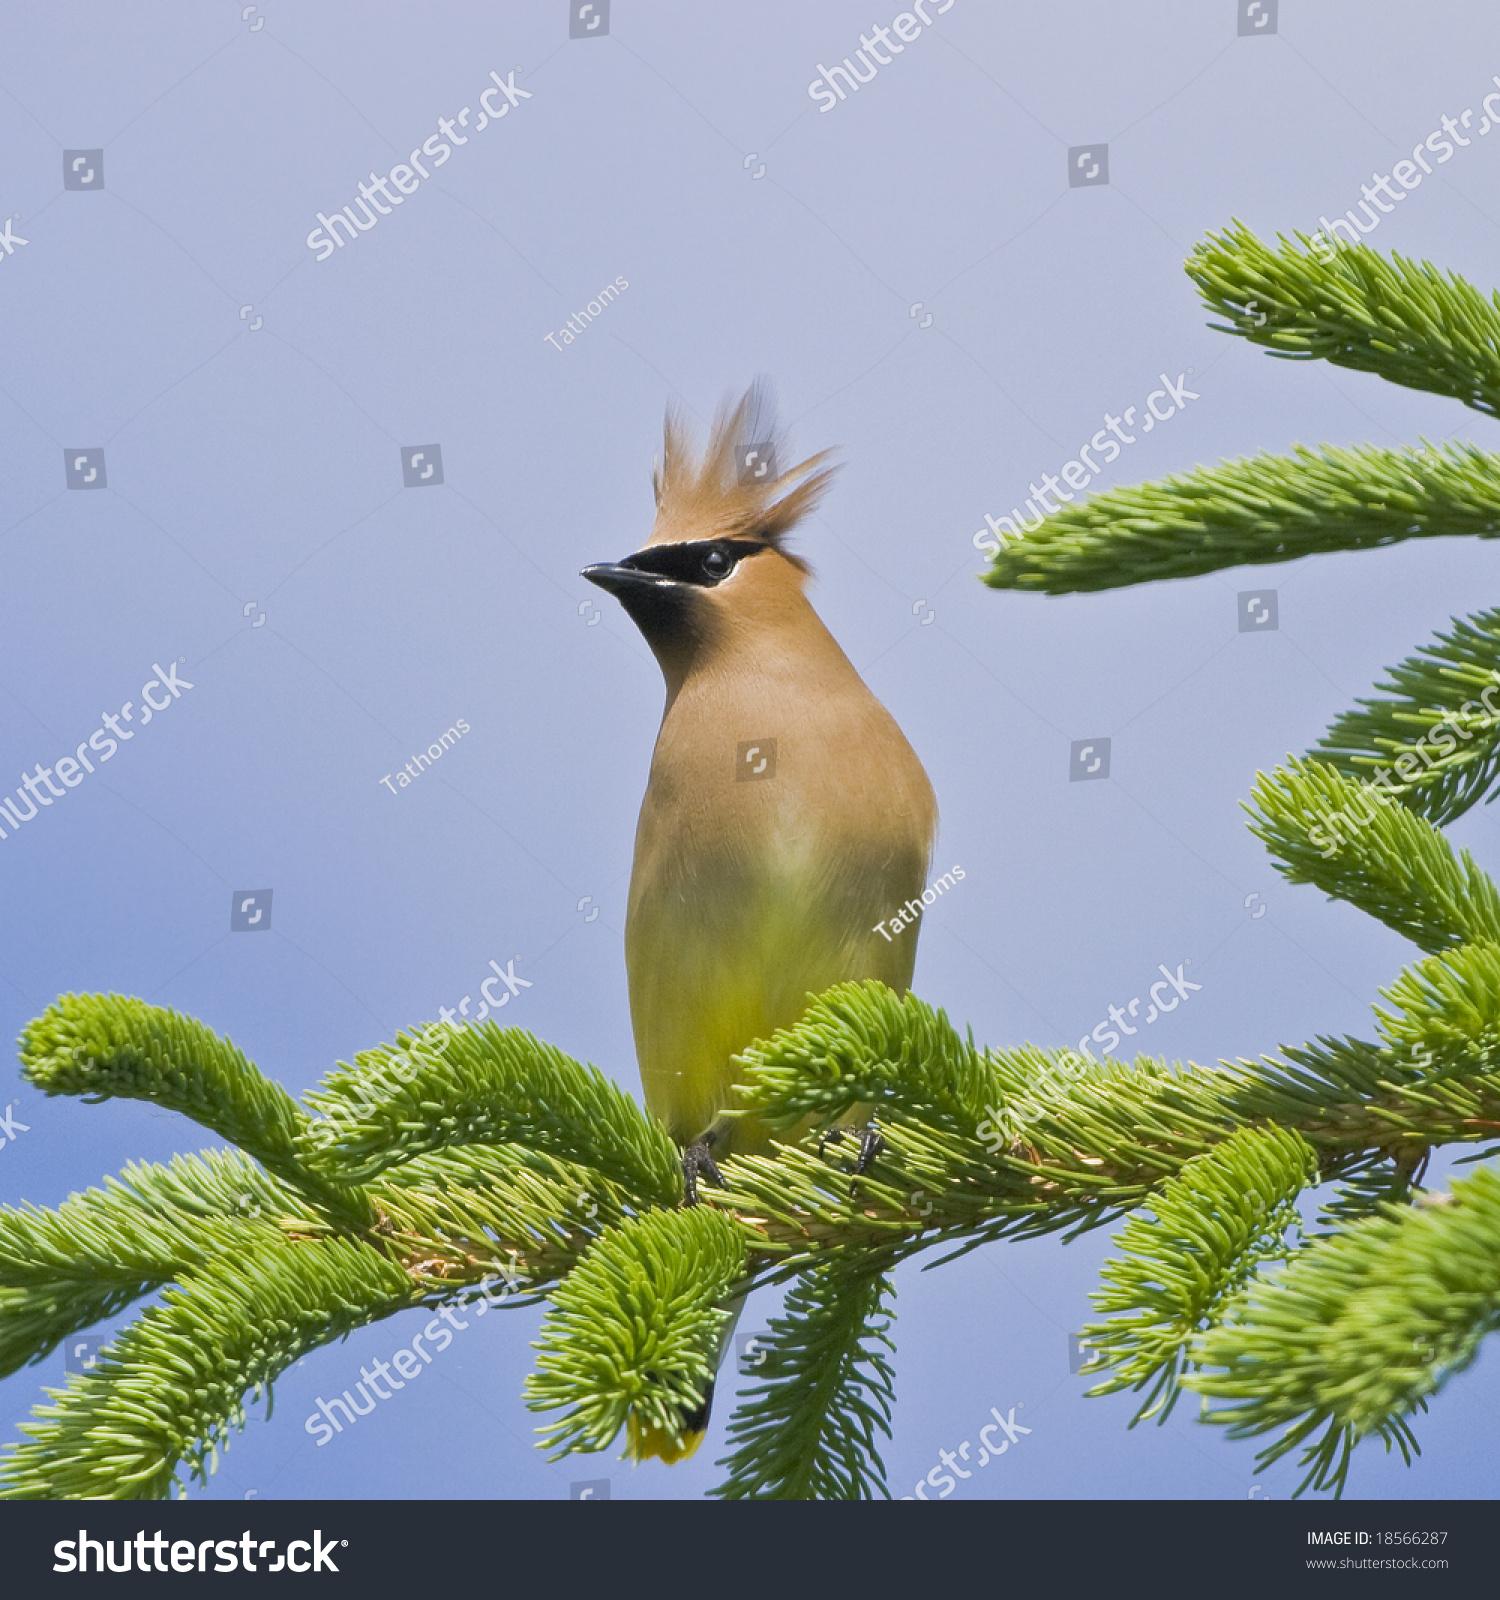 Cedar Waxwing, latin name - Bombycilla cedrorum